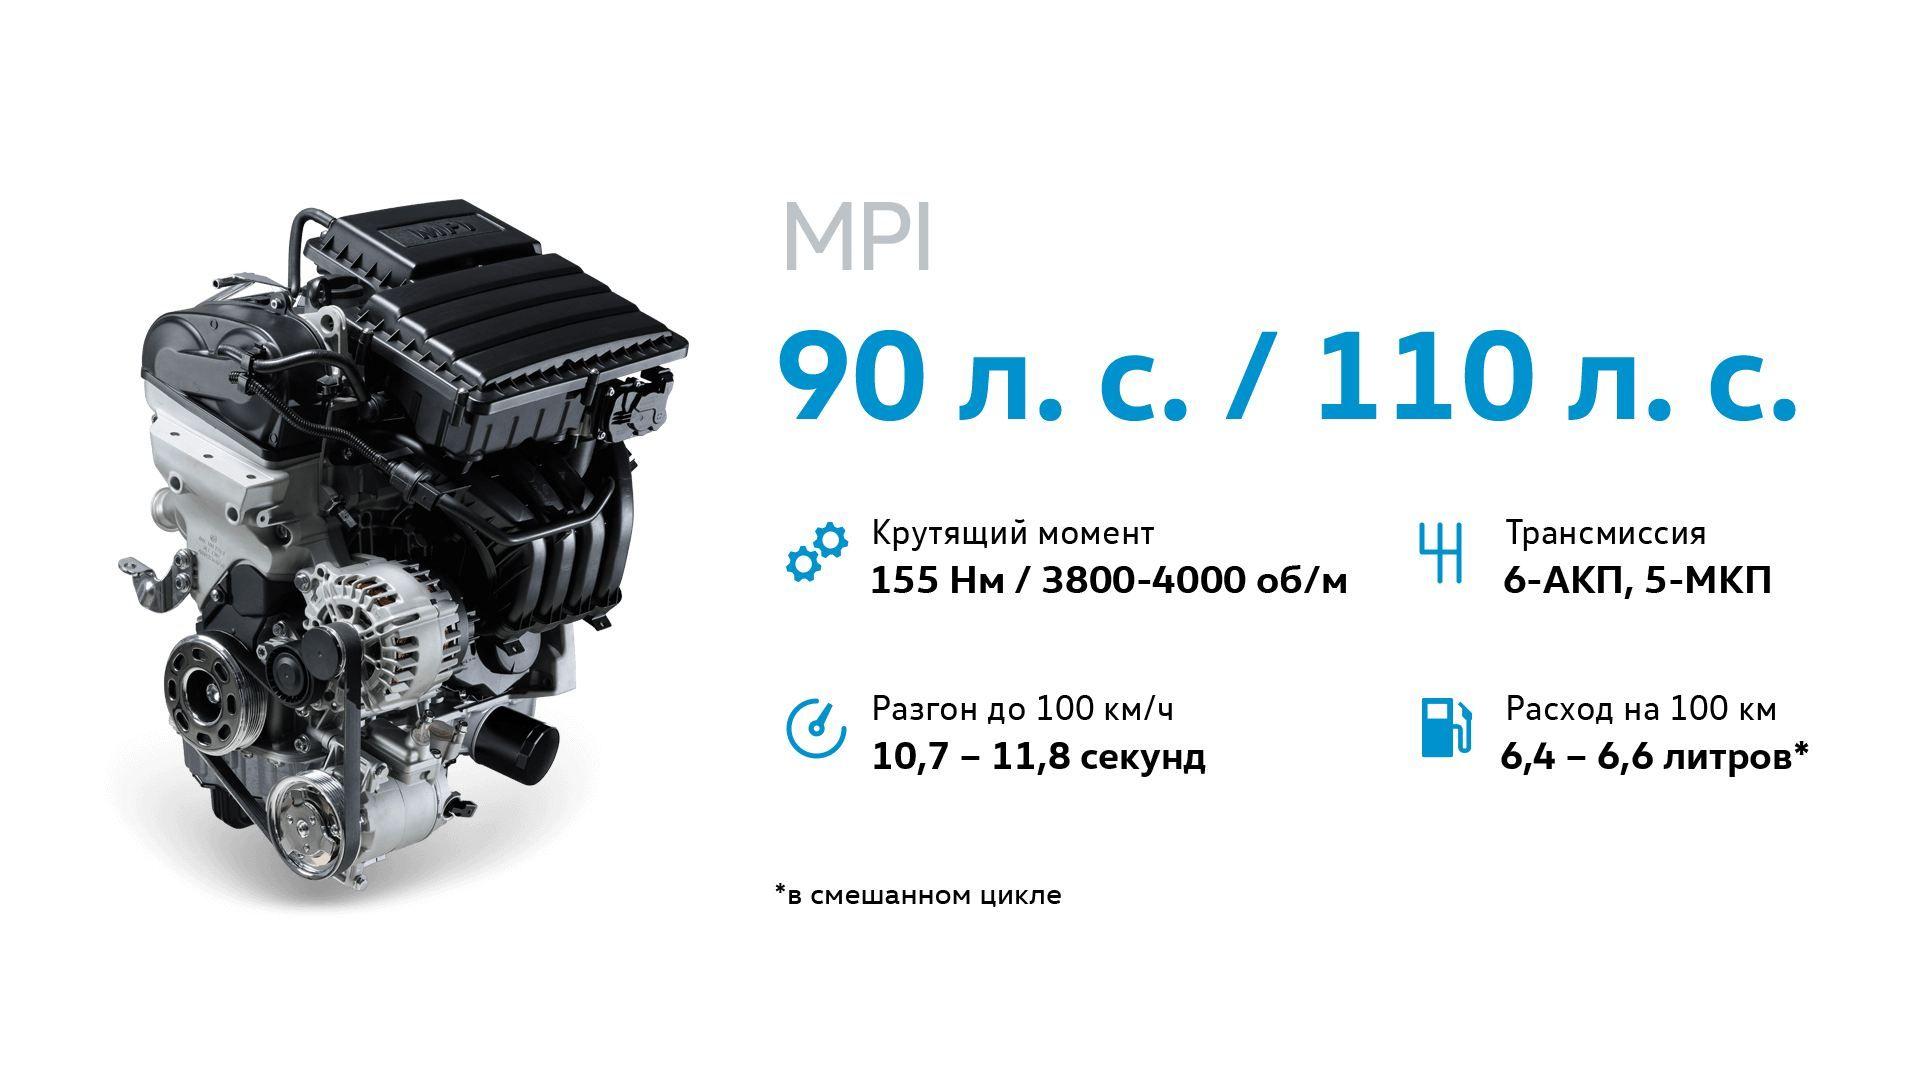 Двигатель MPI 90 л. с. / 110 л. с.